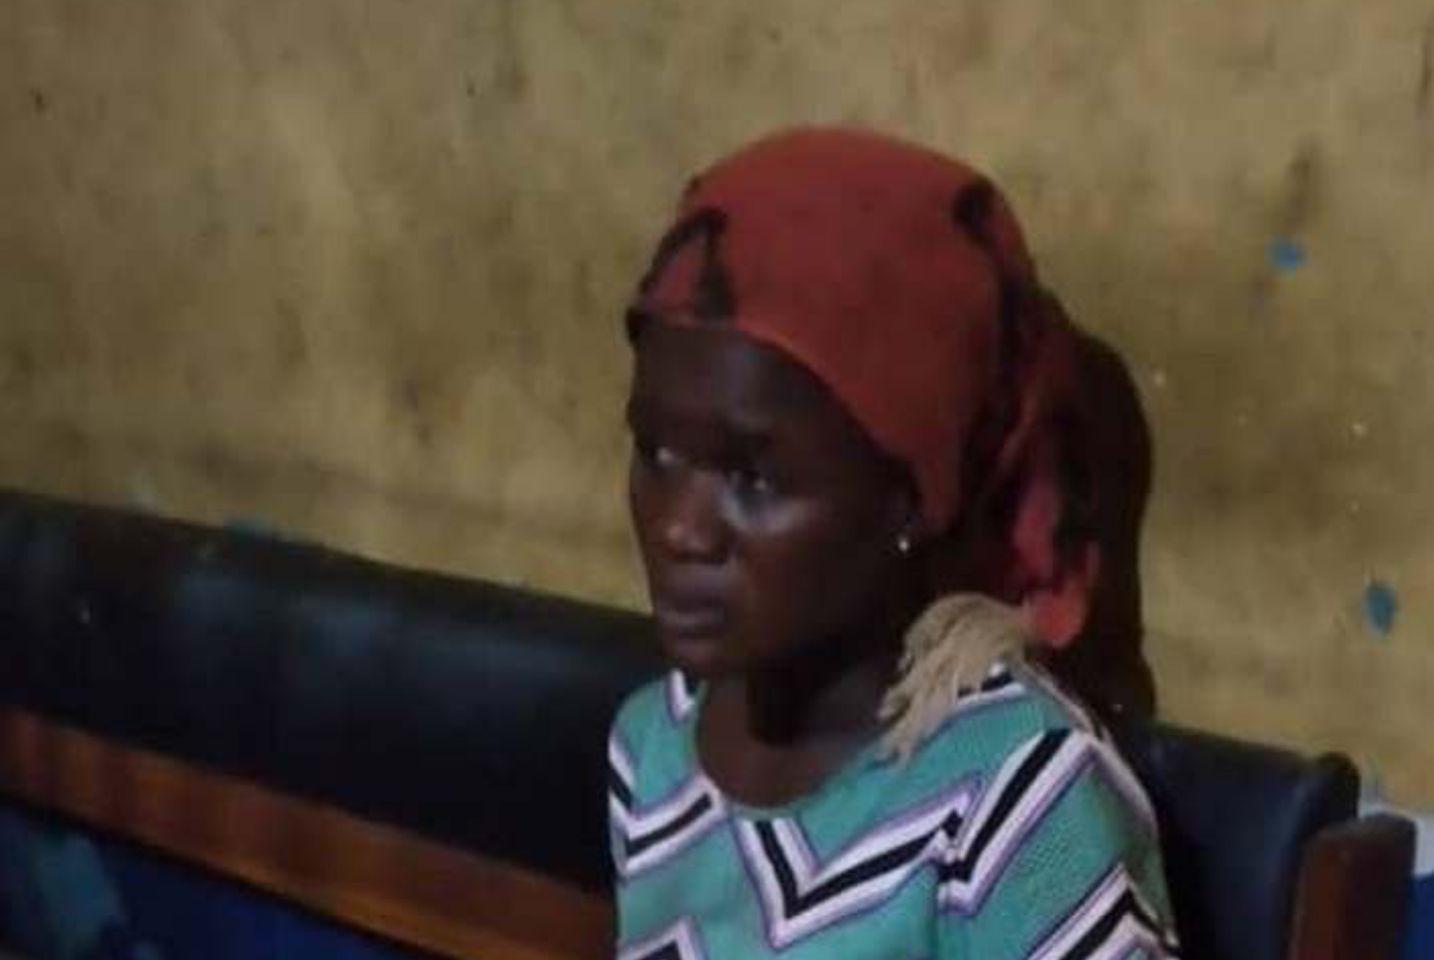 Murderer of 90-year-old, Akua Denteh is her Granddaughter